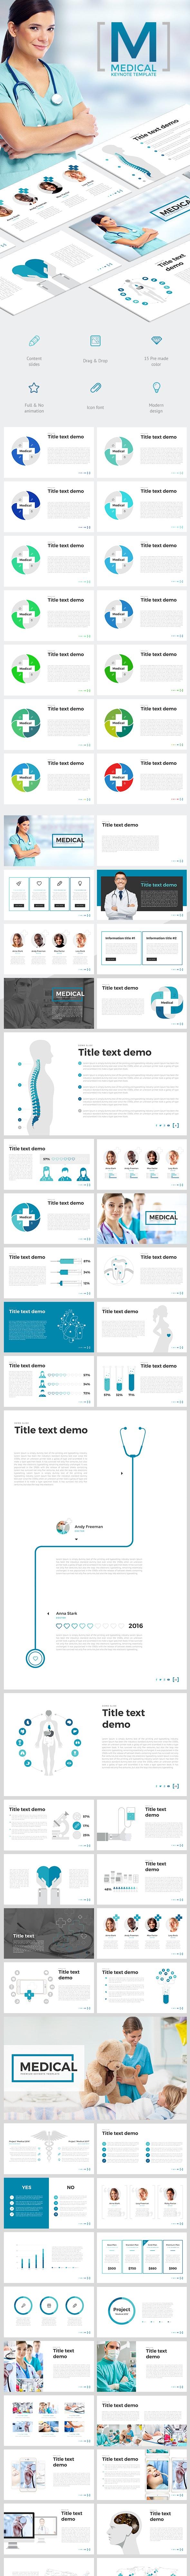 Medical - Keynote Templates Presentation Templates